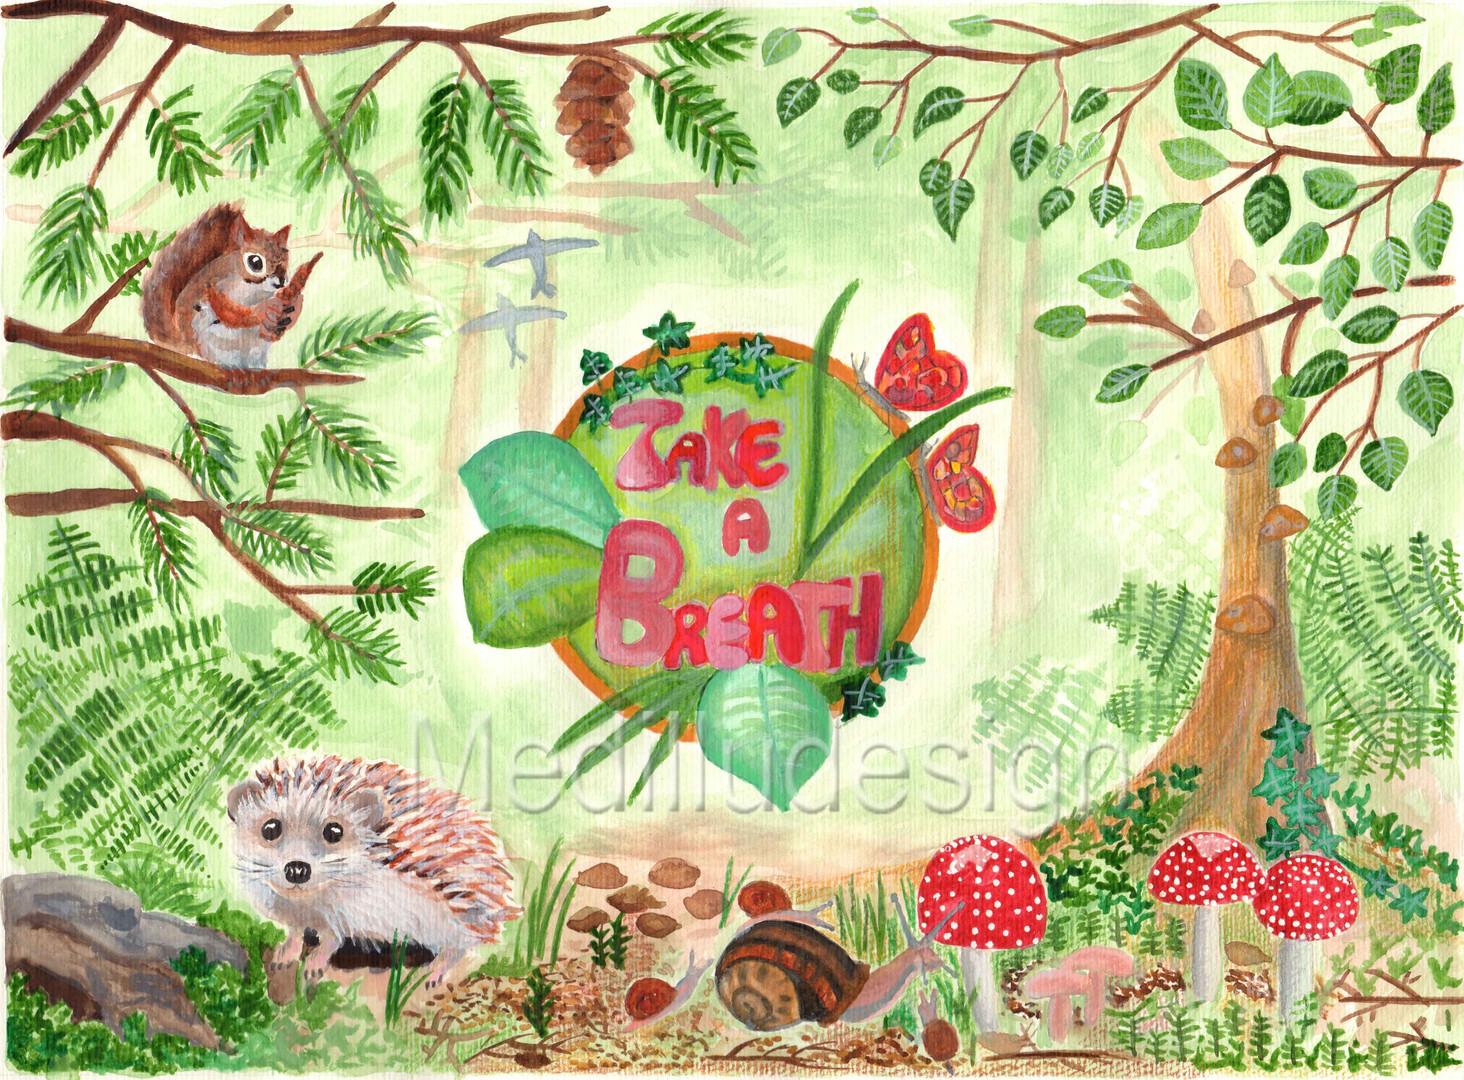 Ecotherapy forest 96 DPI-WM.jpg